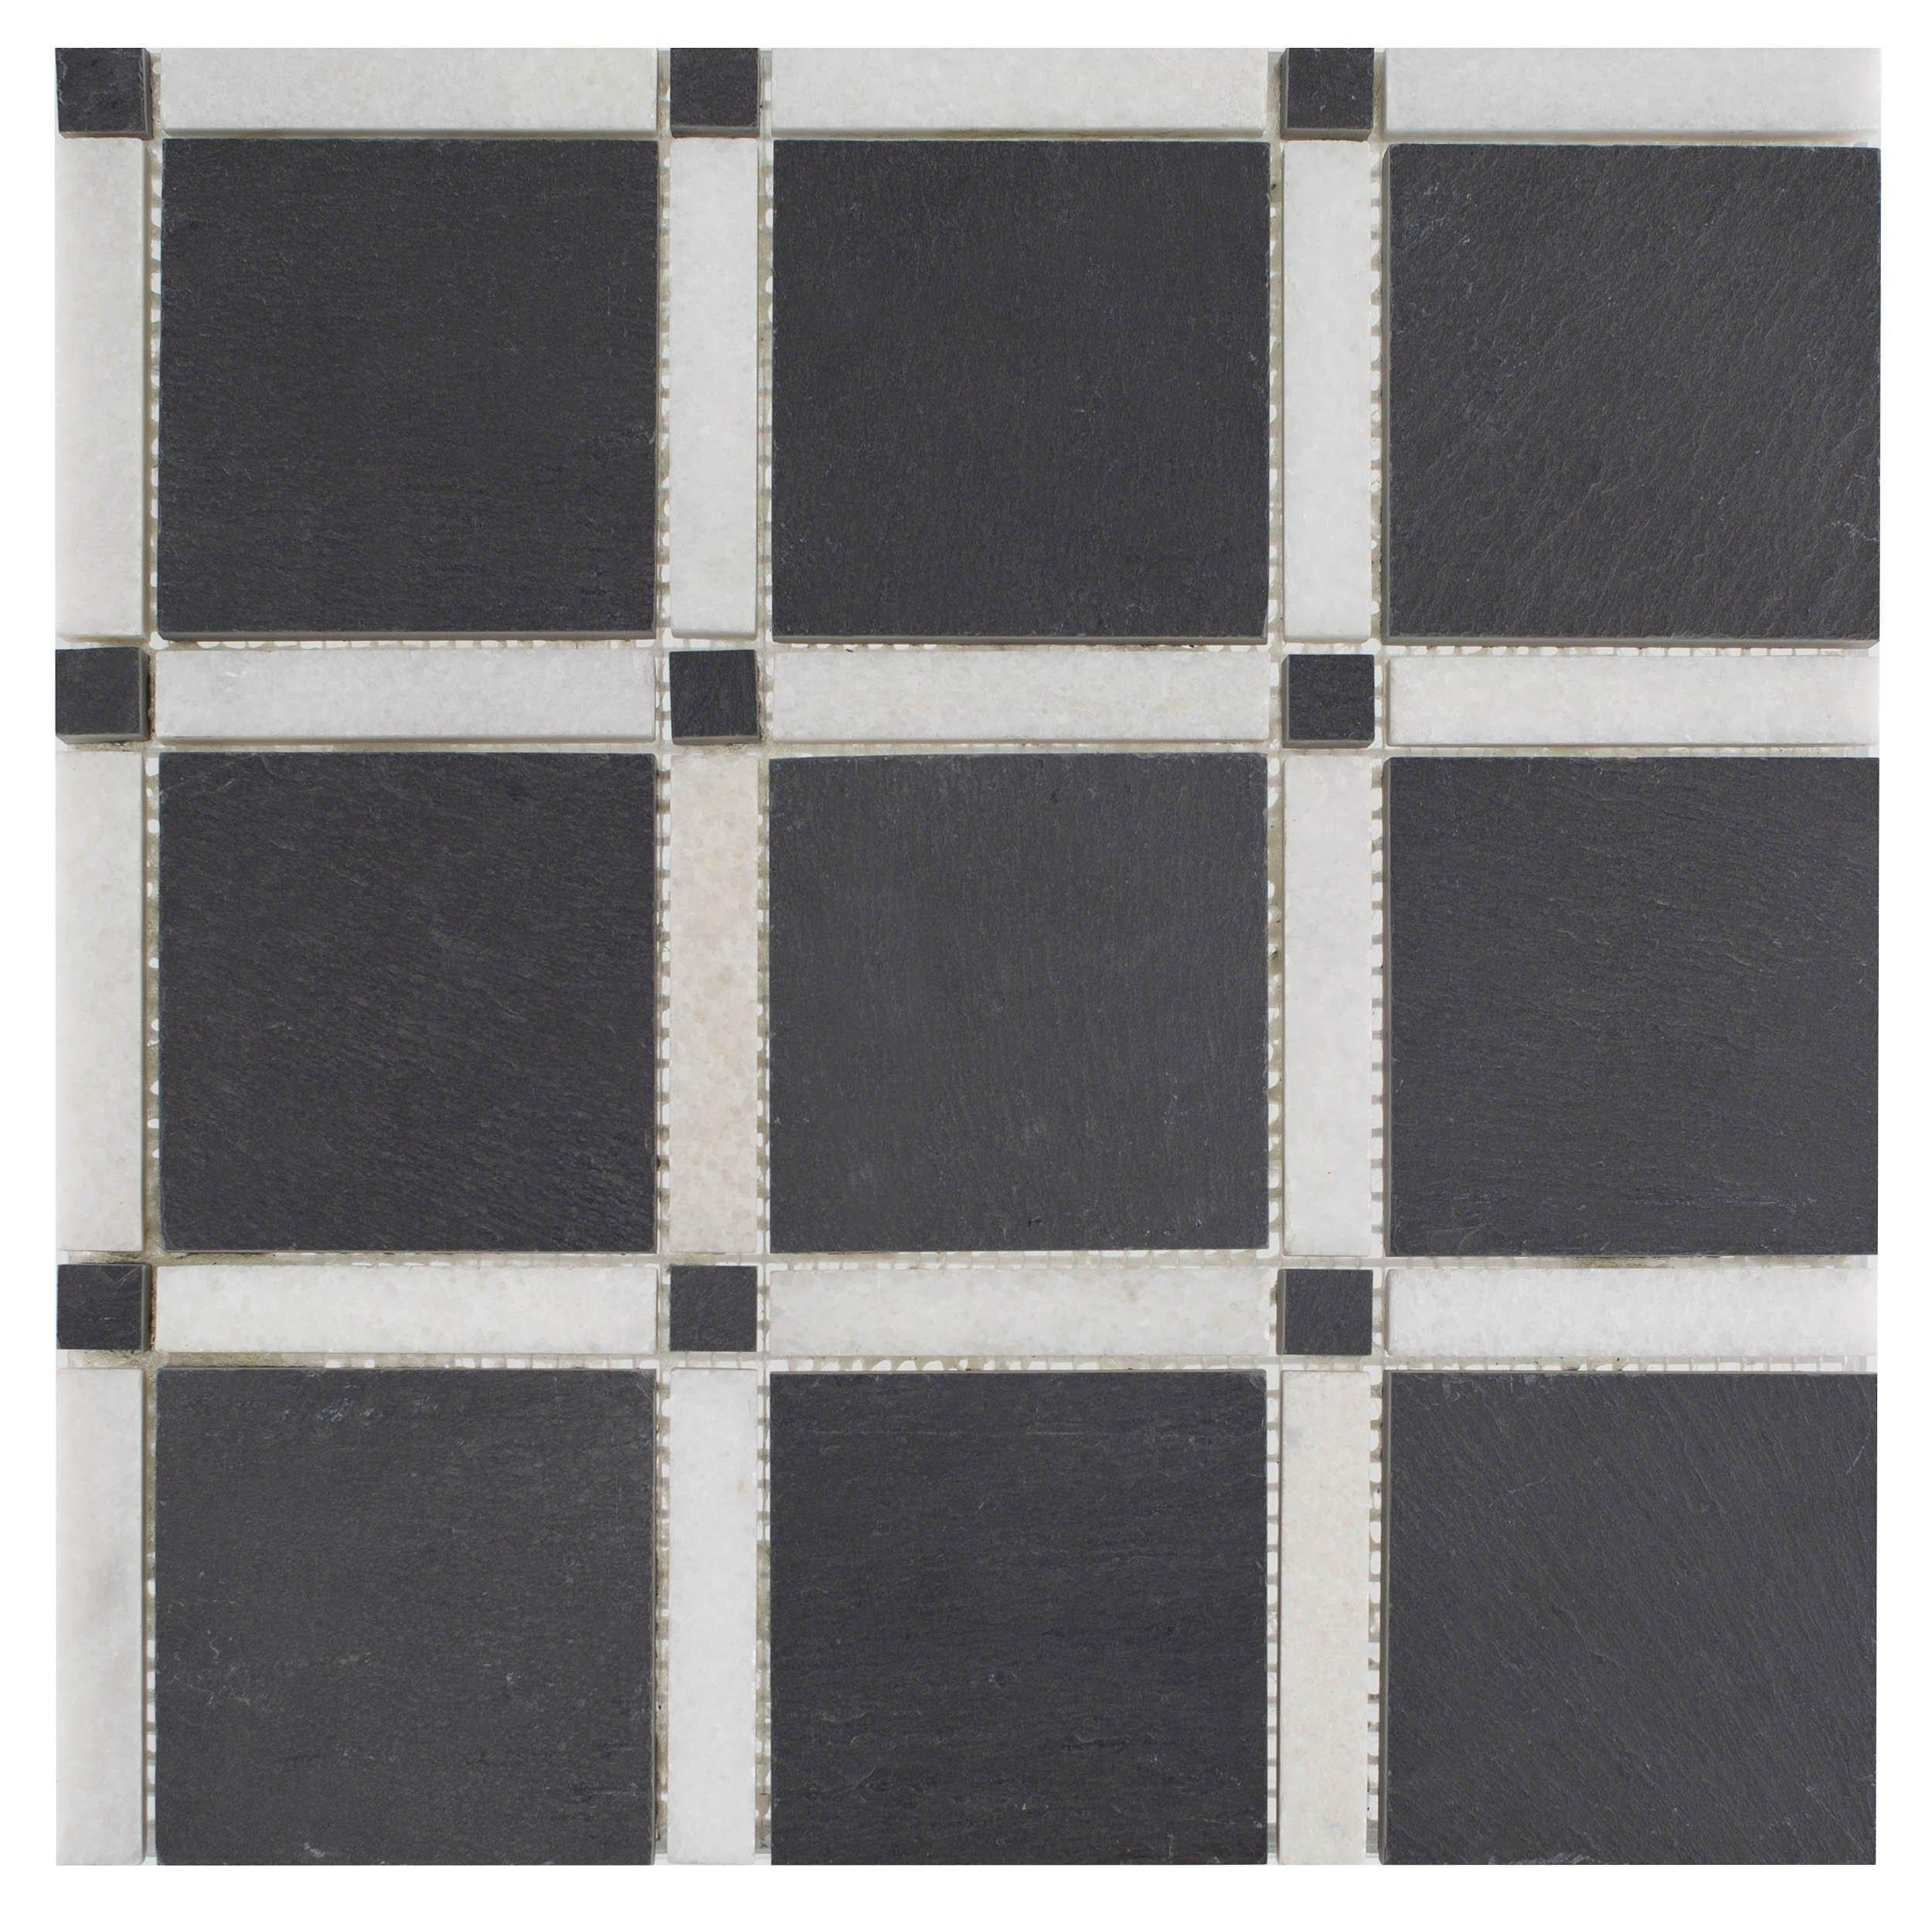 Black And White Forum Honed Slate Mosaic Marble Mosaic Floor Decor Natural Stone Tile